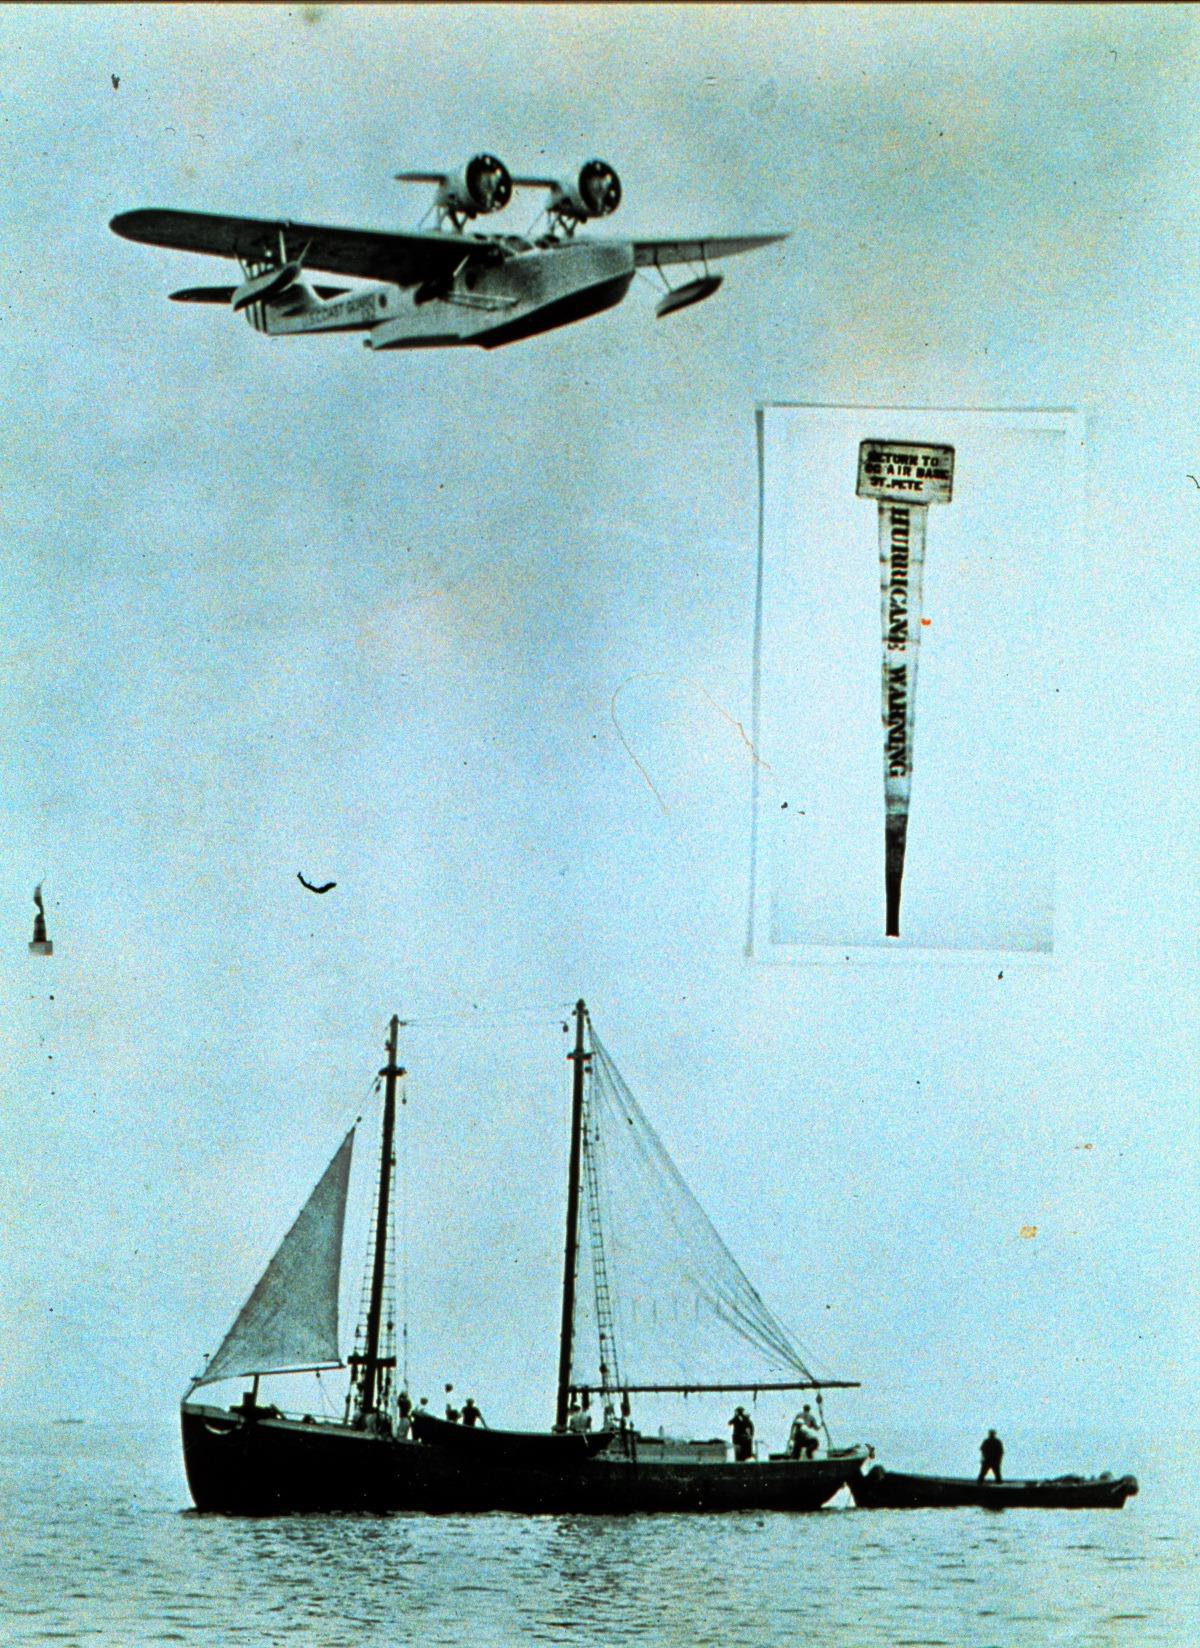 Coast Guard aircraft hand dropping hurricane warnings to sponge fishermen in 1938